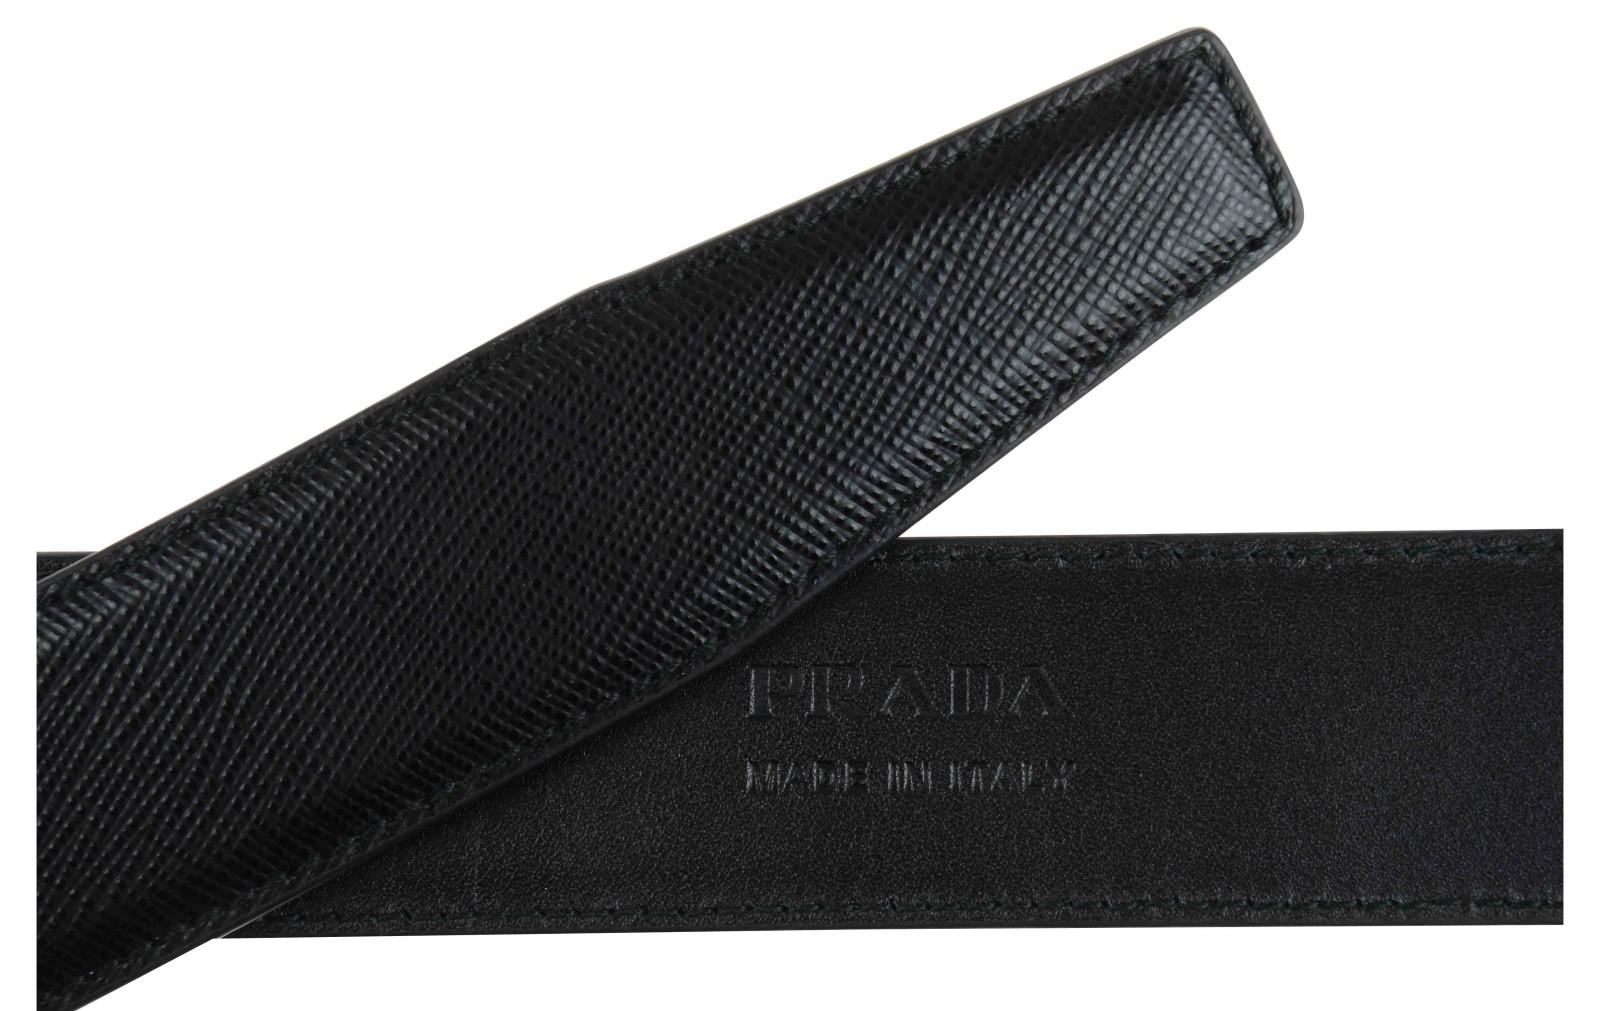 Prada Cintura Uomo Pelle Saffiano Nero in Black for Men (Nero) | Lyst